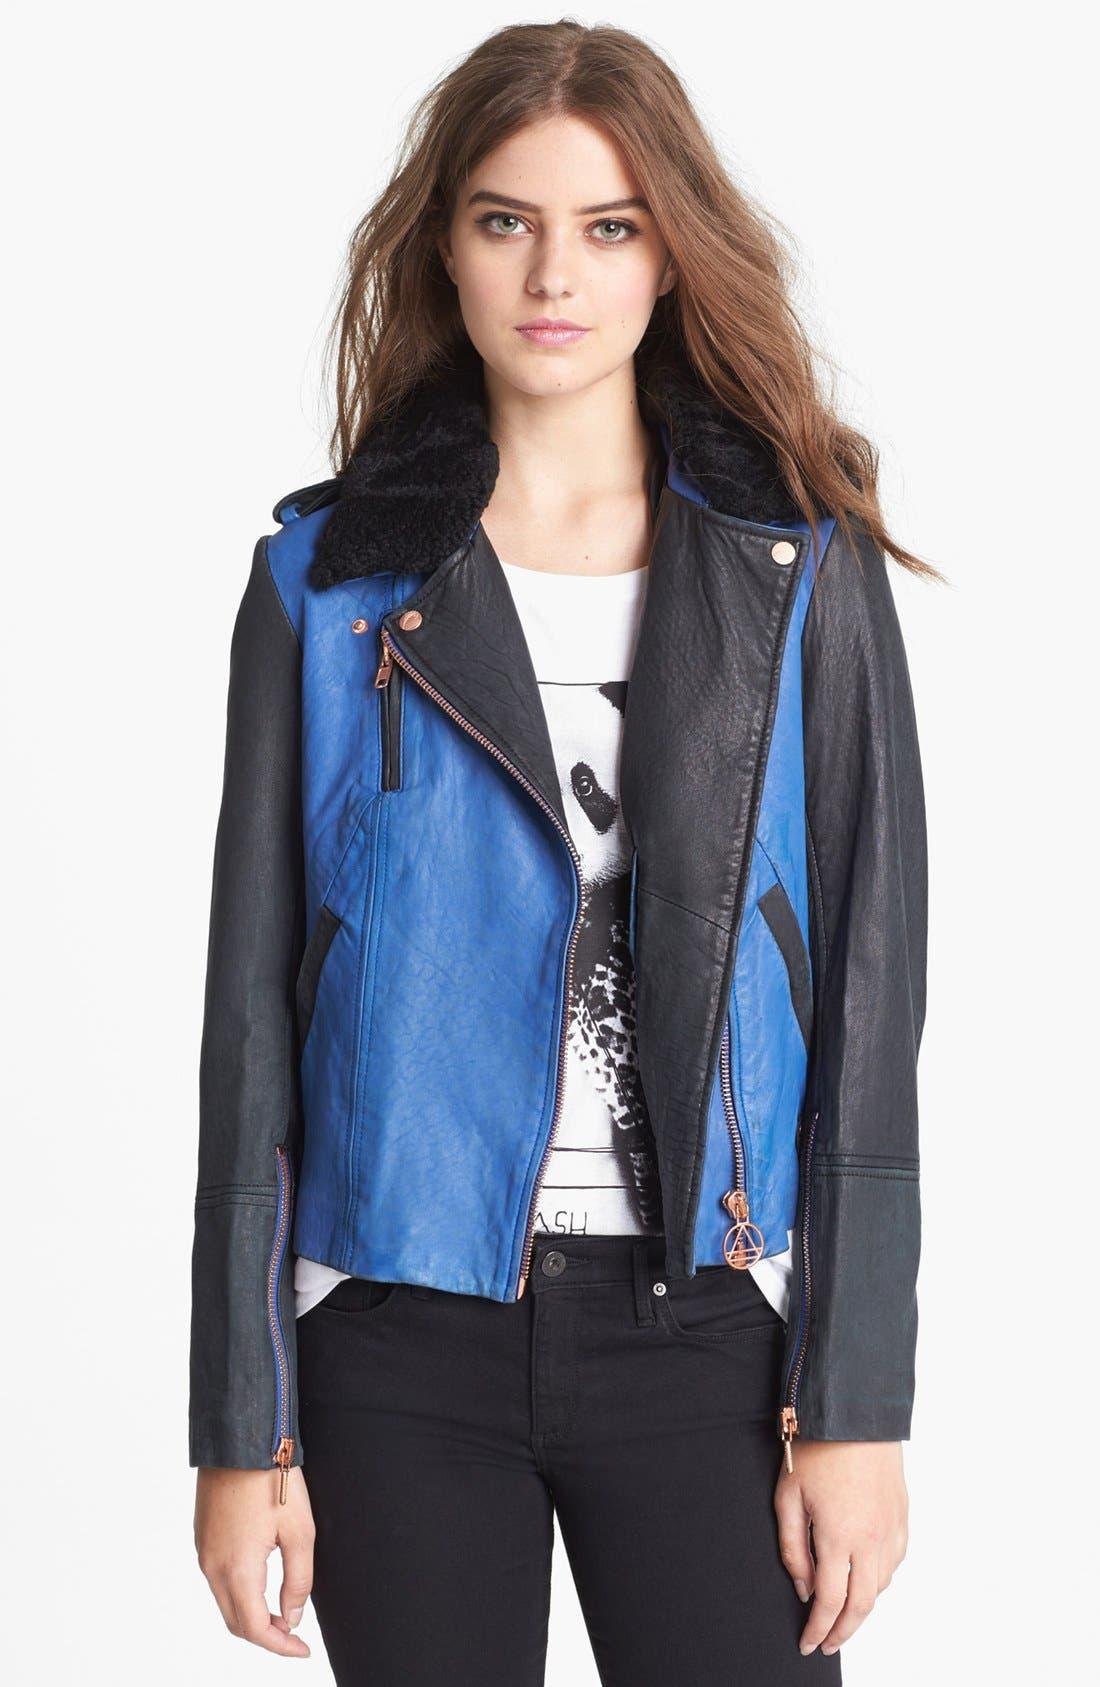 Alternate Image 1 Selected - ELEVENPARIS 'Trinite' Leather Jacket